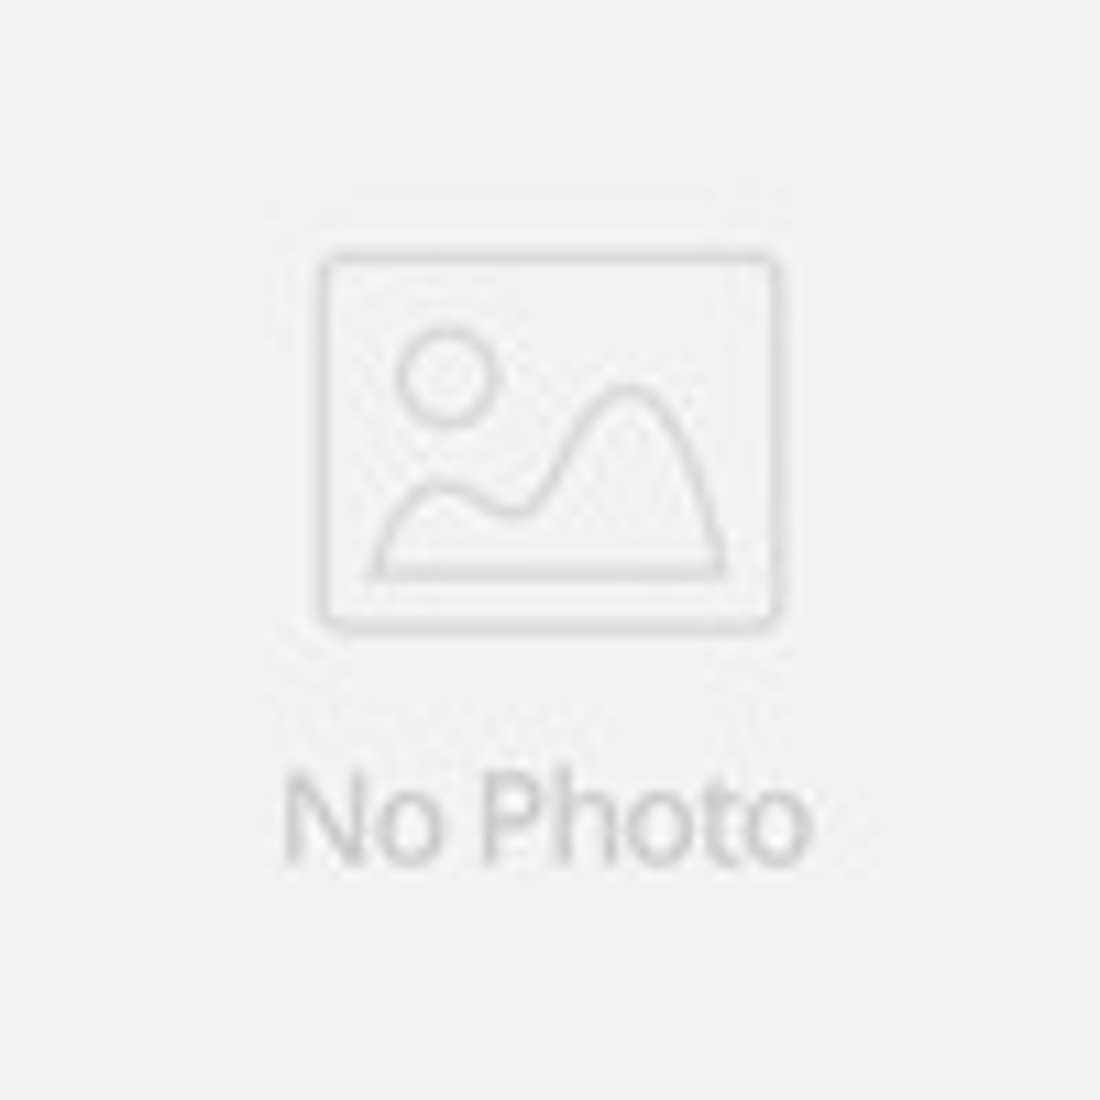 Acquista all u0026#39;ingrosso Online nave acquario ornamento da Grossisti nave acquario ornamento Cinesi